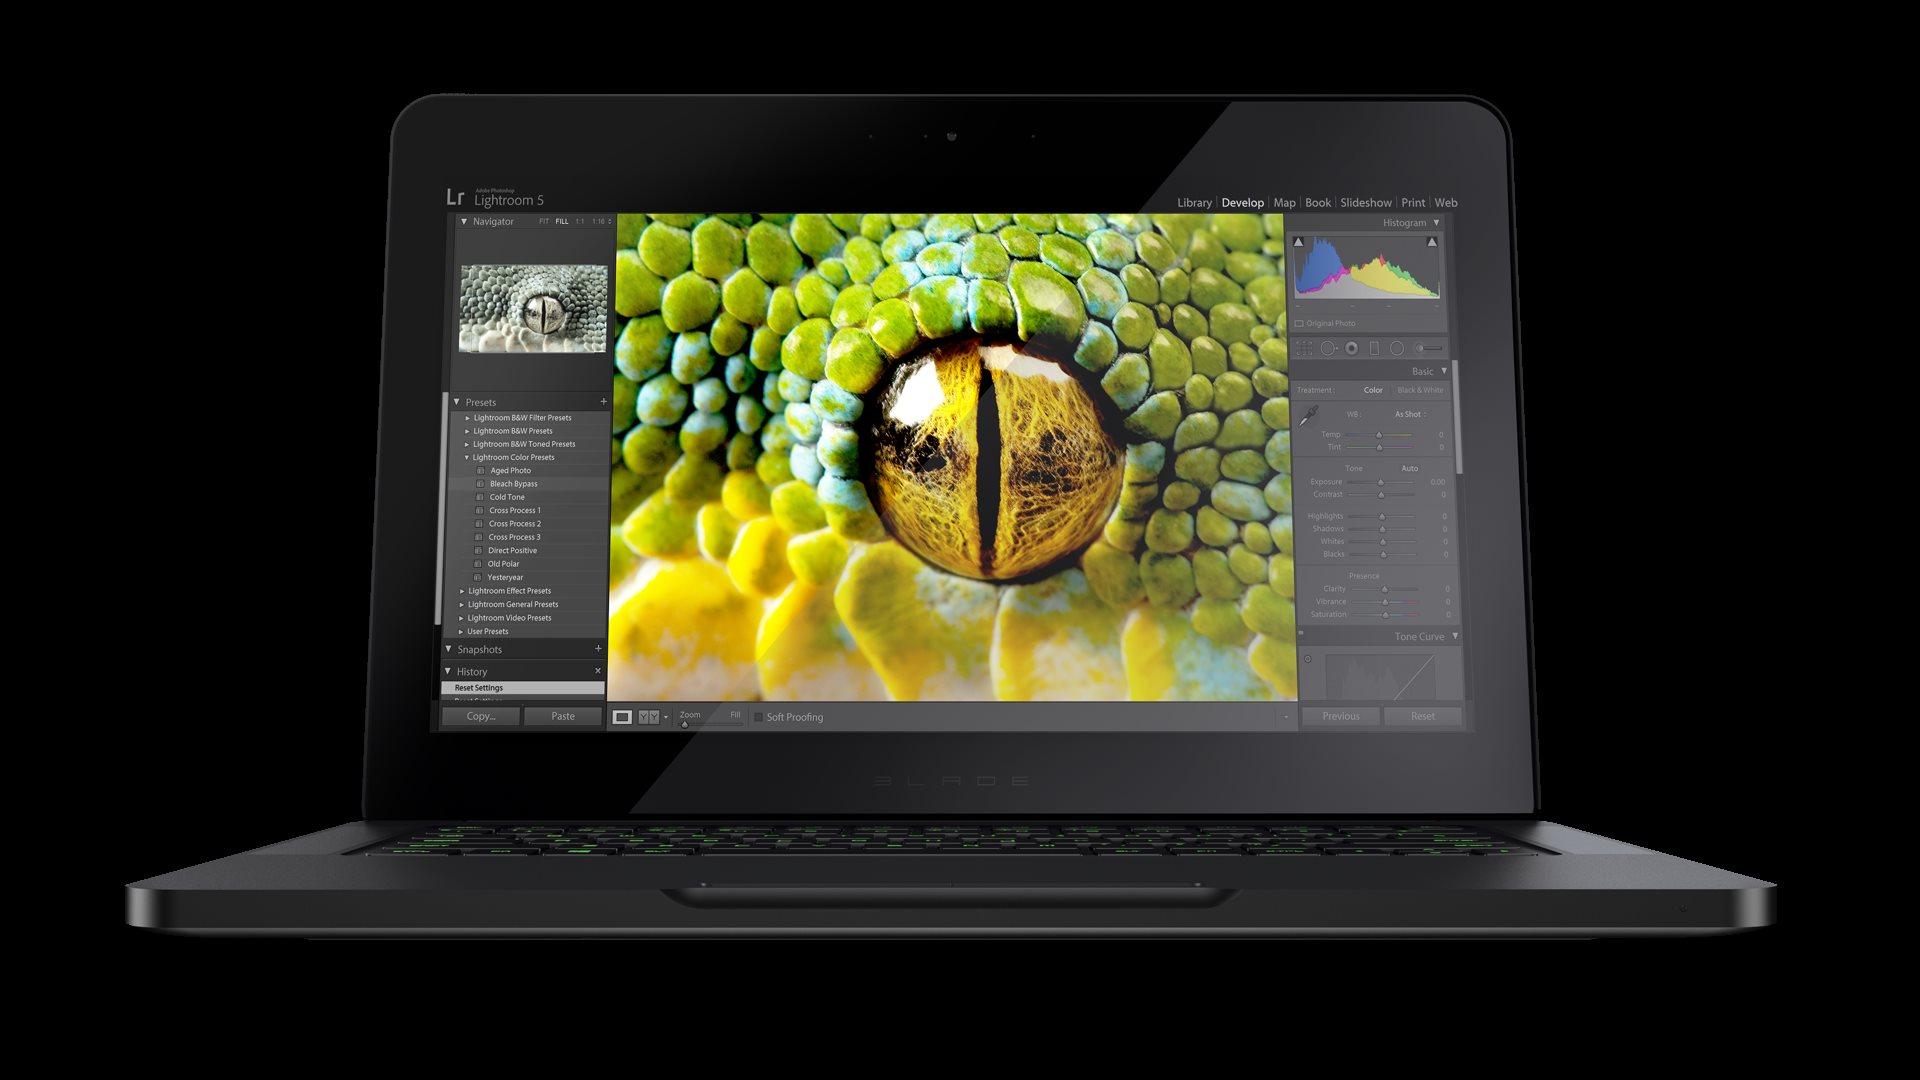 Latest Gaming Desktop Wallpapers Hd besides Sunrise World 00427245 174789 together with RAZER BLADE GAMING LAPTOP game  puter  19 moreover 18021 also Razor Blade Laptop Wallpaper. on koenigsegg razer